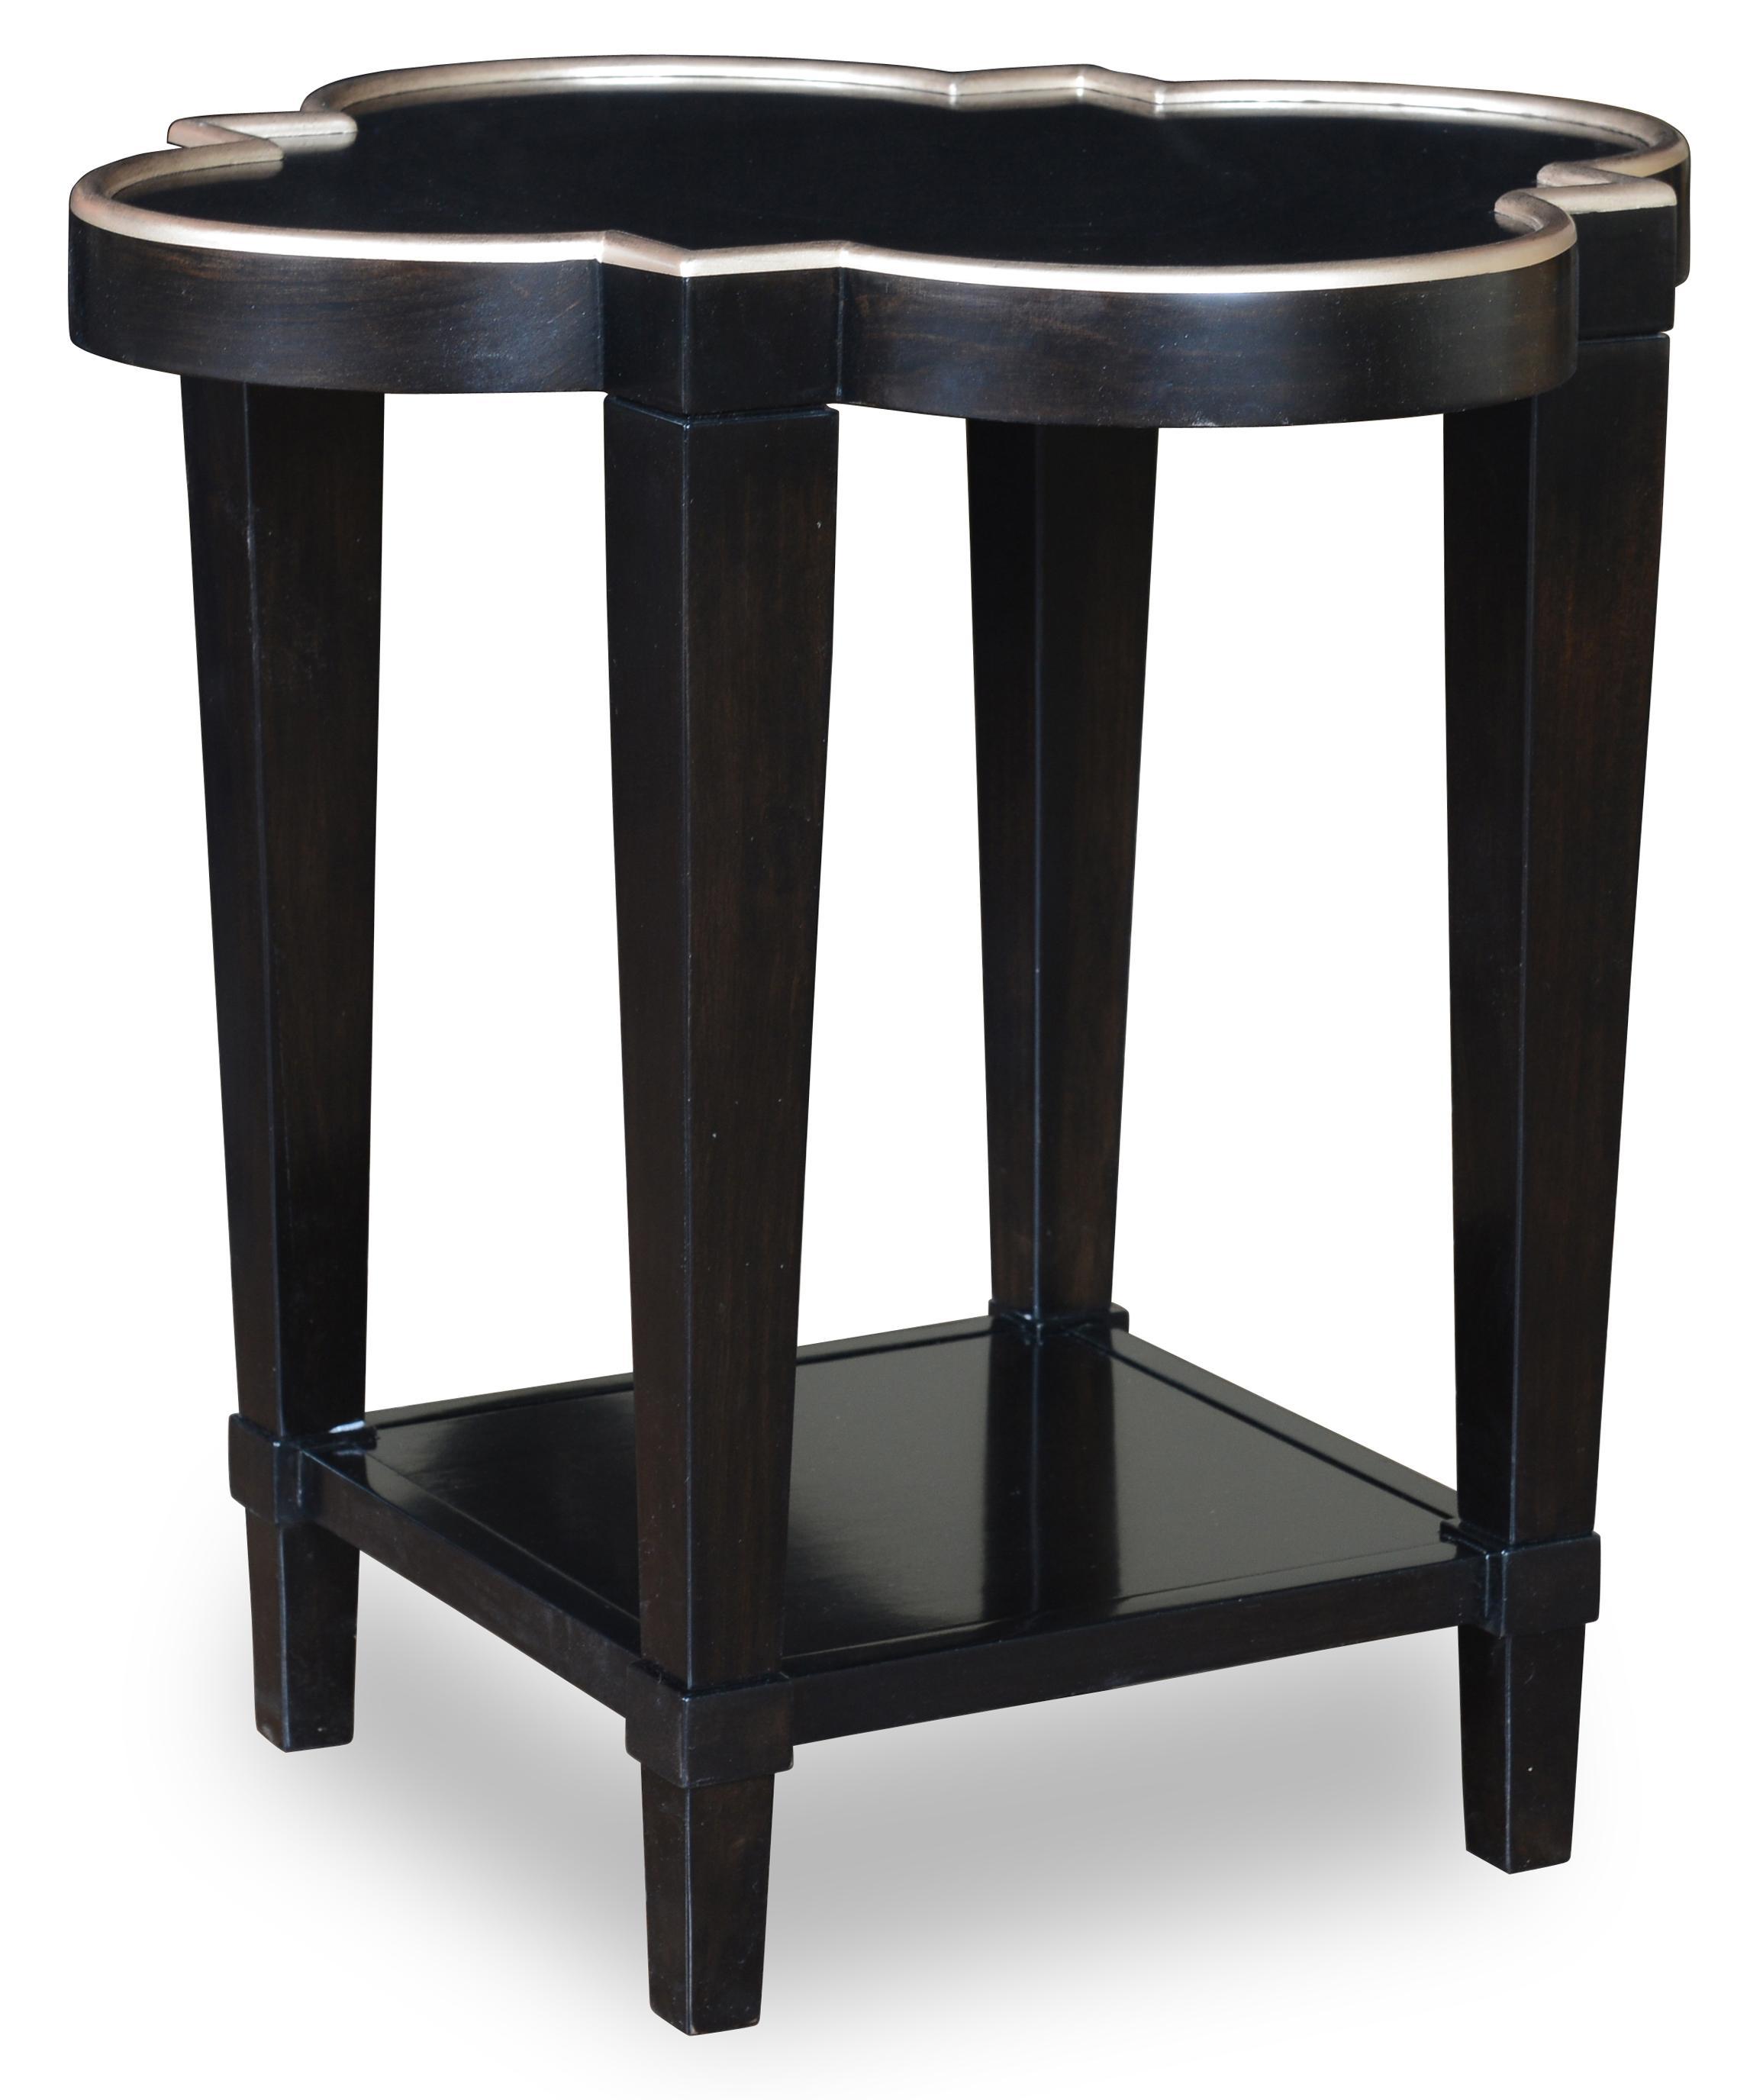 Belfort Signature Magellan Shaped End Table - Item Number: 208303-1815